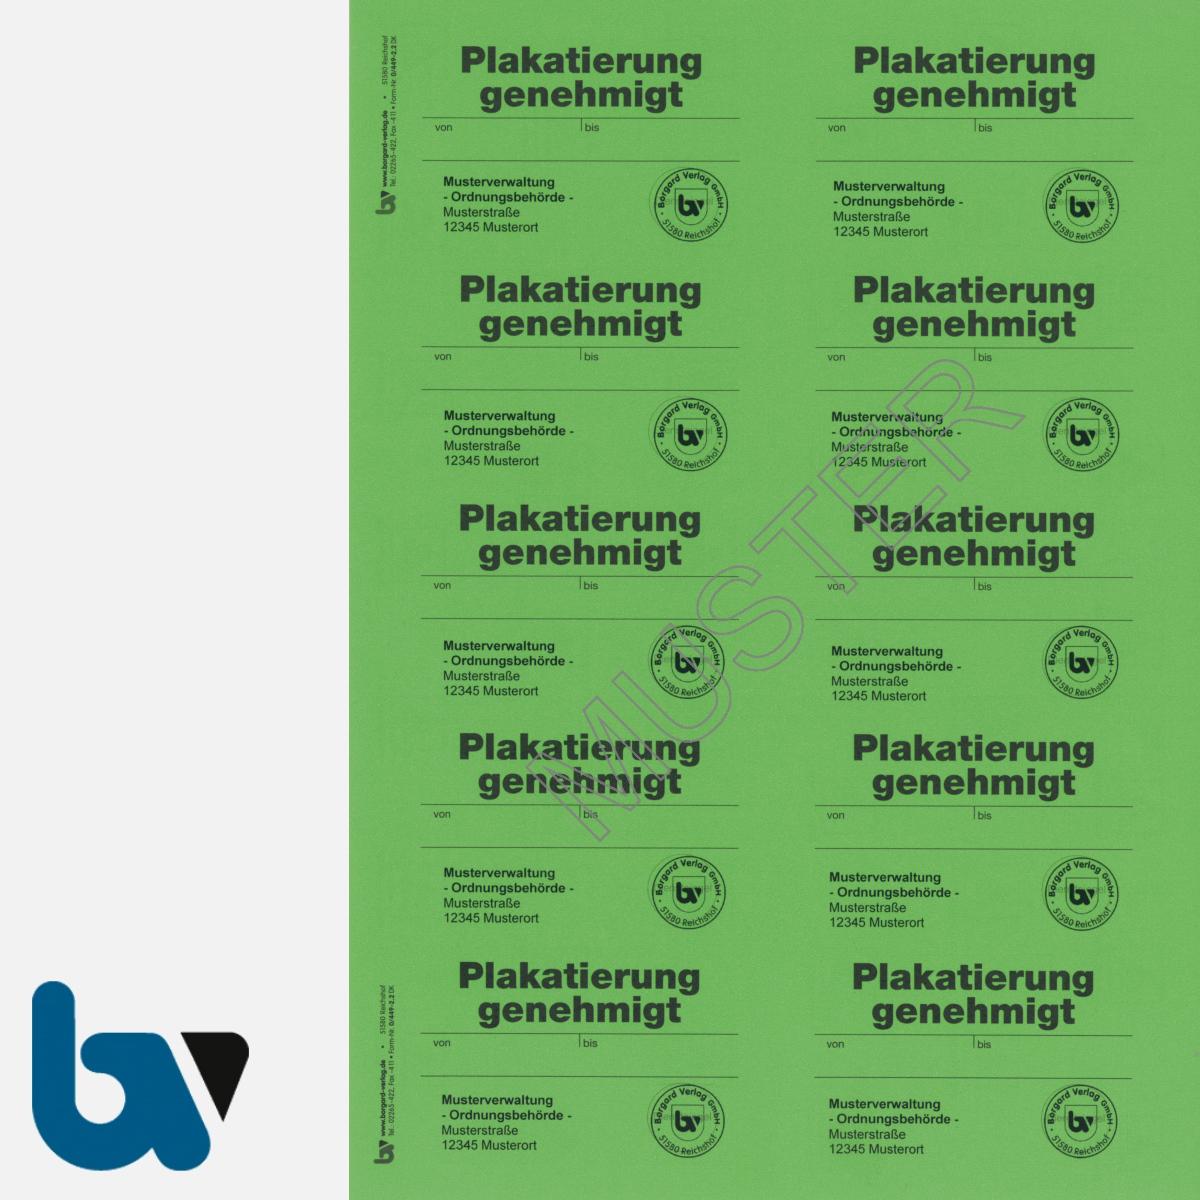 0/449-2.2 Aufkleber Plakatierung Genehmigt Muster leucht grün 75 x 50 mm selbstklebend Bogen 10 Stück DIN A4 | Borgard Verlag GmbH